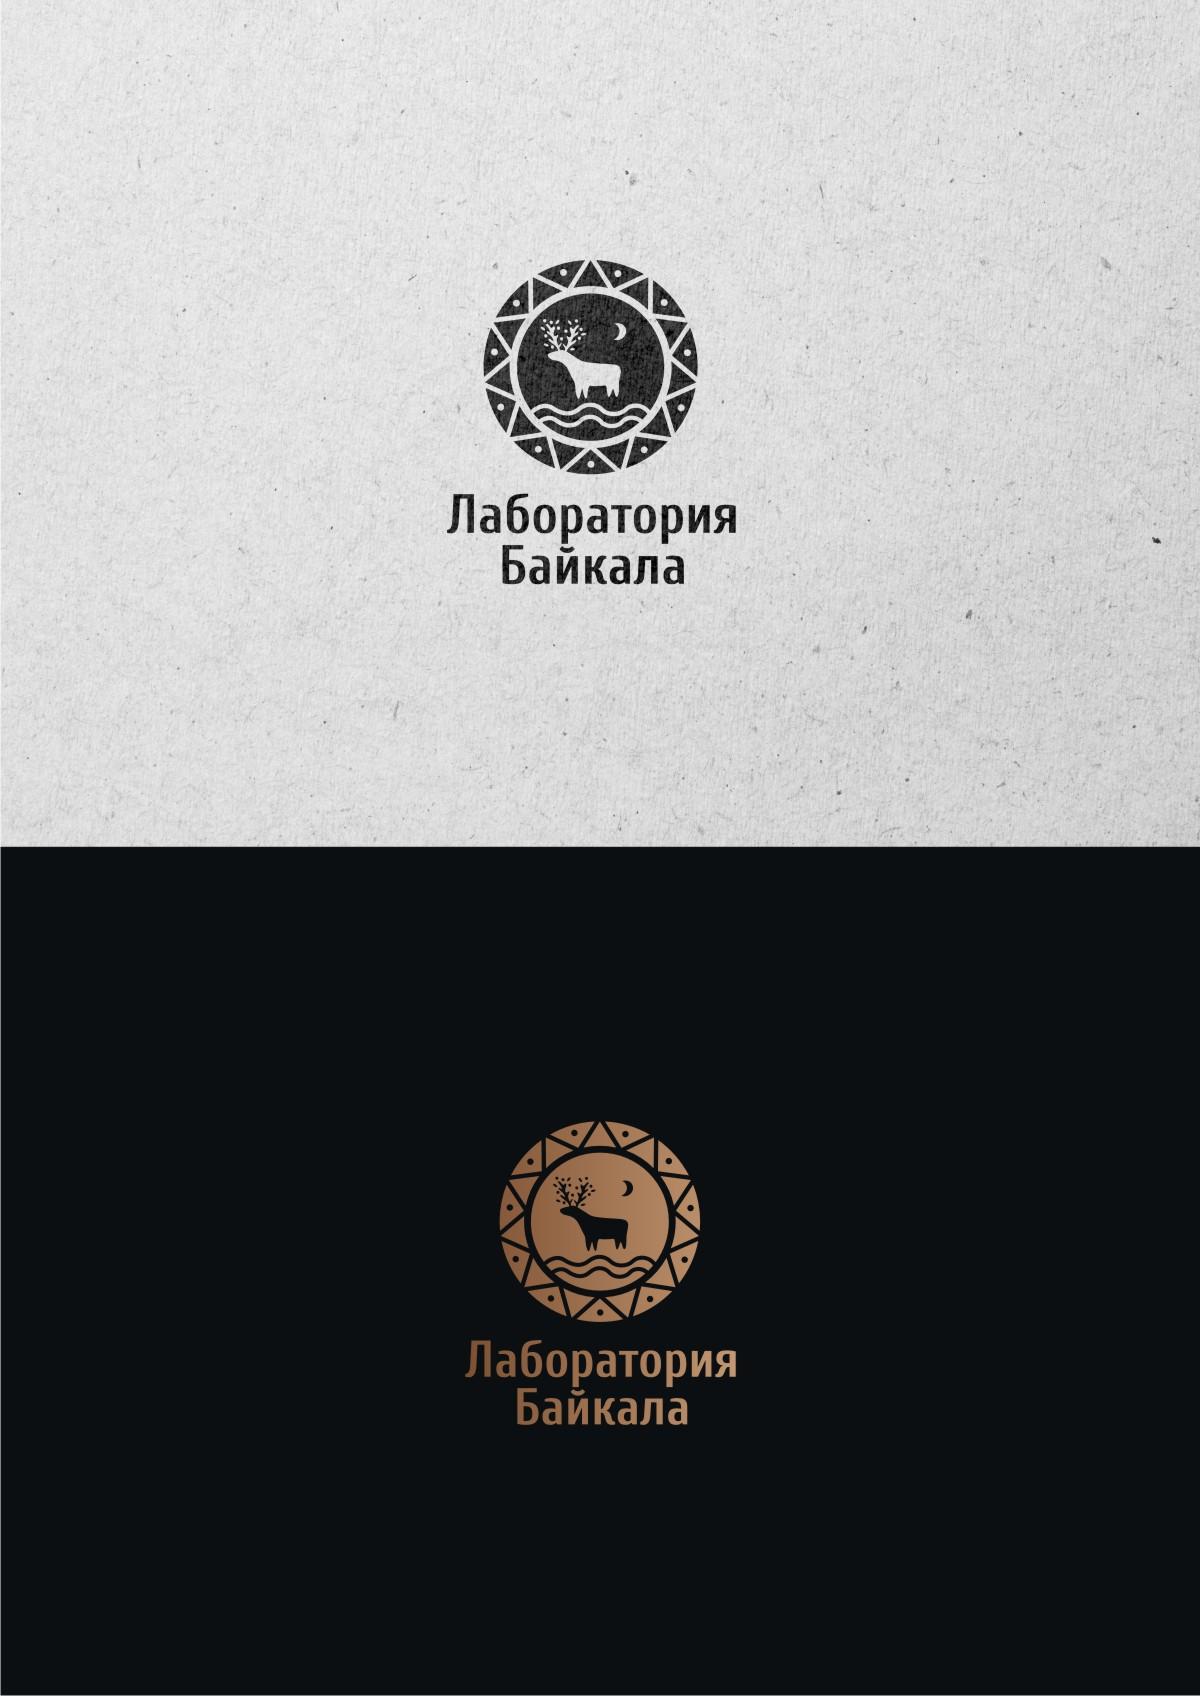 Разработка логотипа торговой марки фото f_031596b0a00750ae.jpg